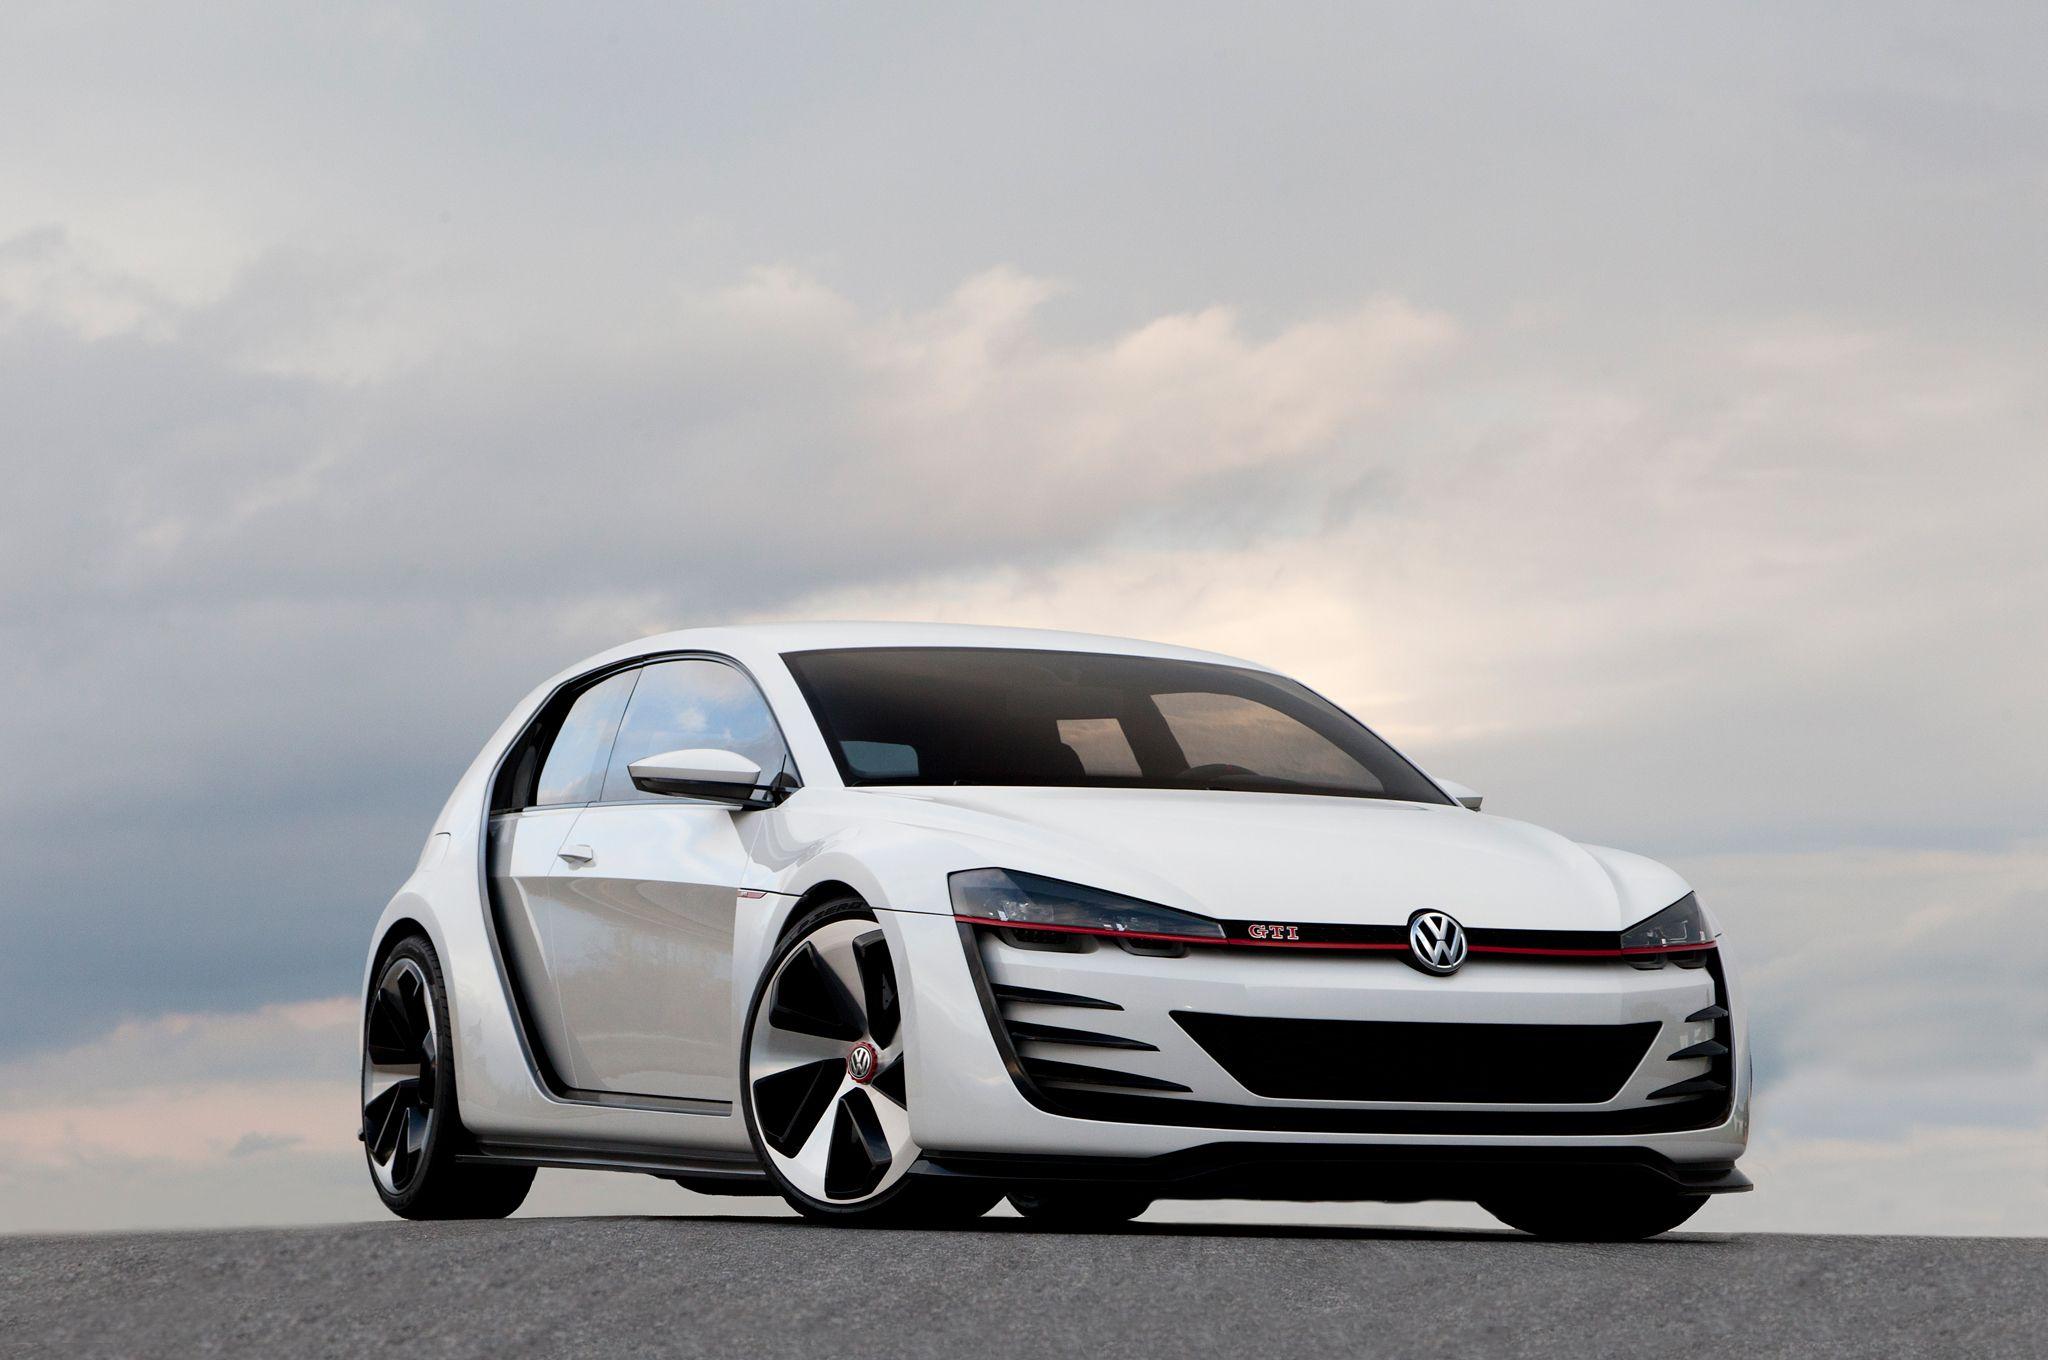 2014 Volkswagen Design Vision Gti Golf Gti Volkswagen Gti